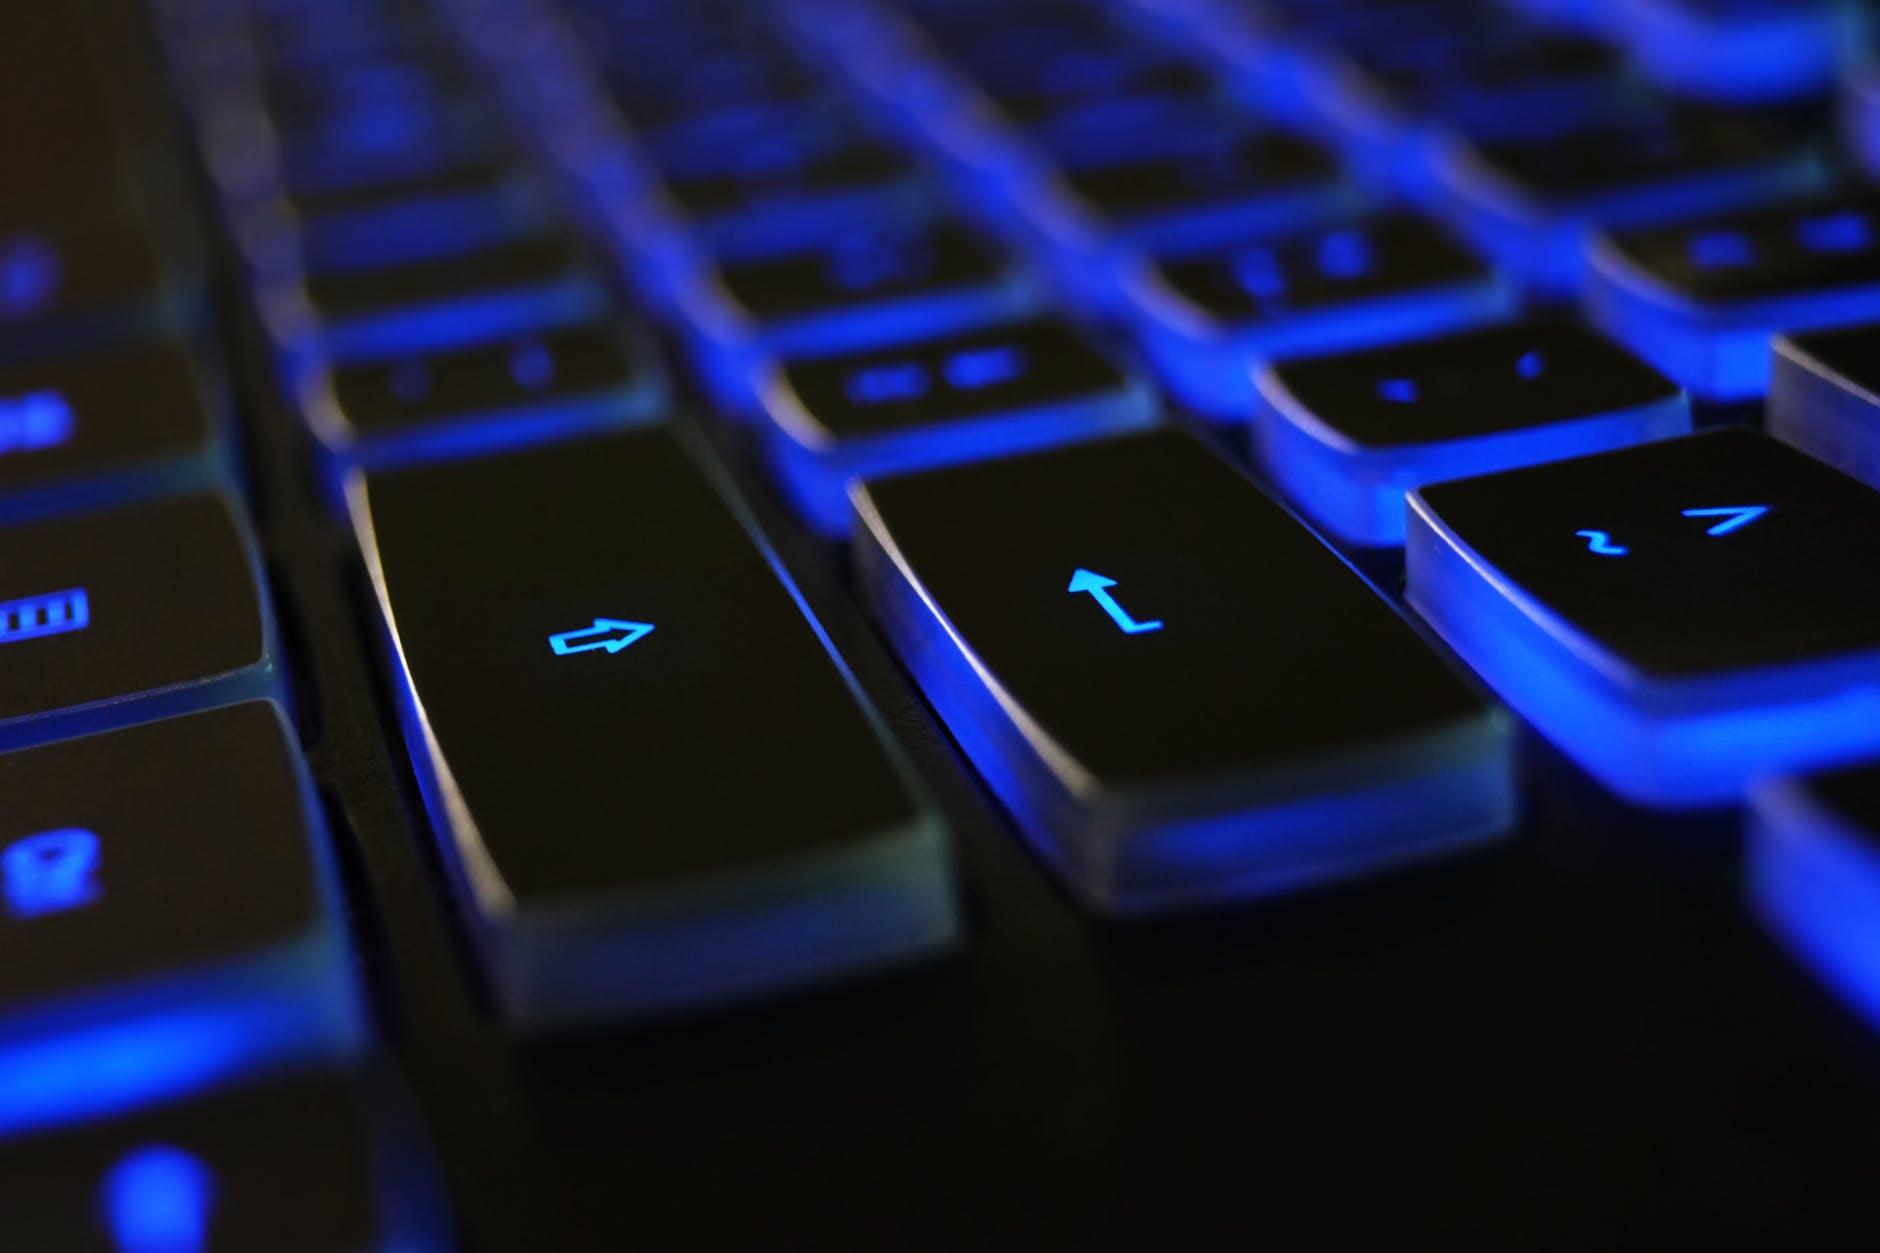 closeup photo of black and blue keyboard